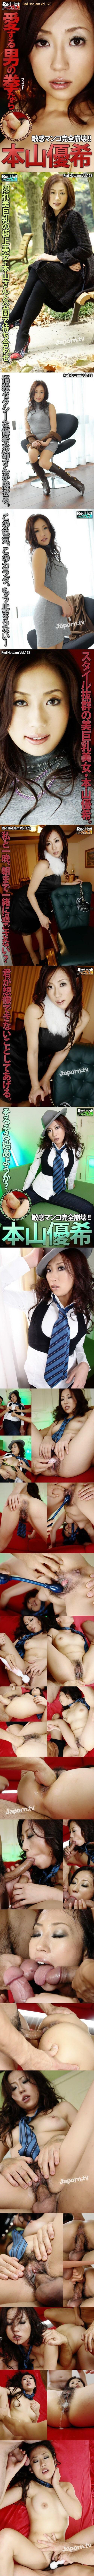 [RHJ 178] Red Hot Jam Vol.178 : モデルコレクション : 本山優希 本山優希 店長推薦 上原優 RHJ